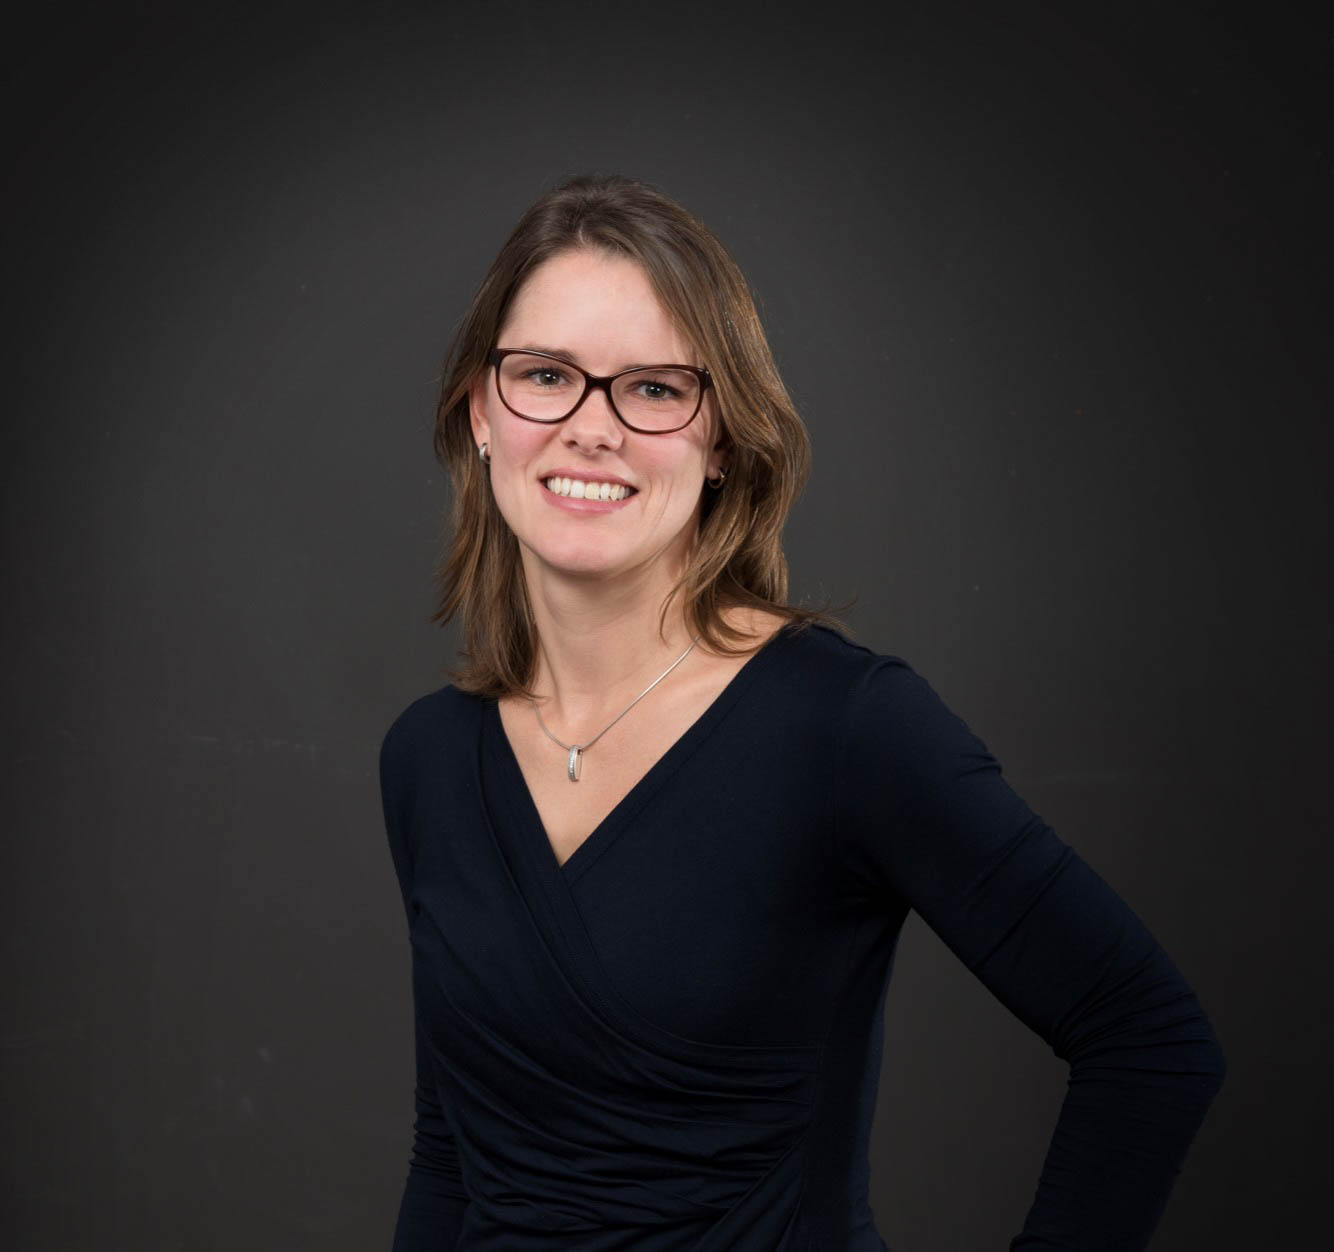 Jolanda van Mullem - Civil Support